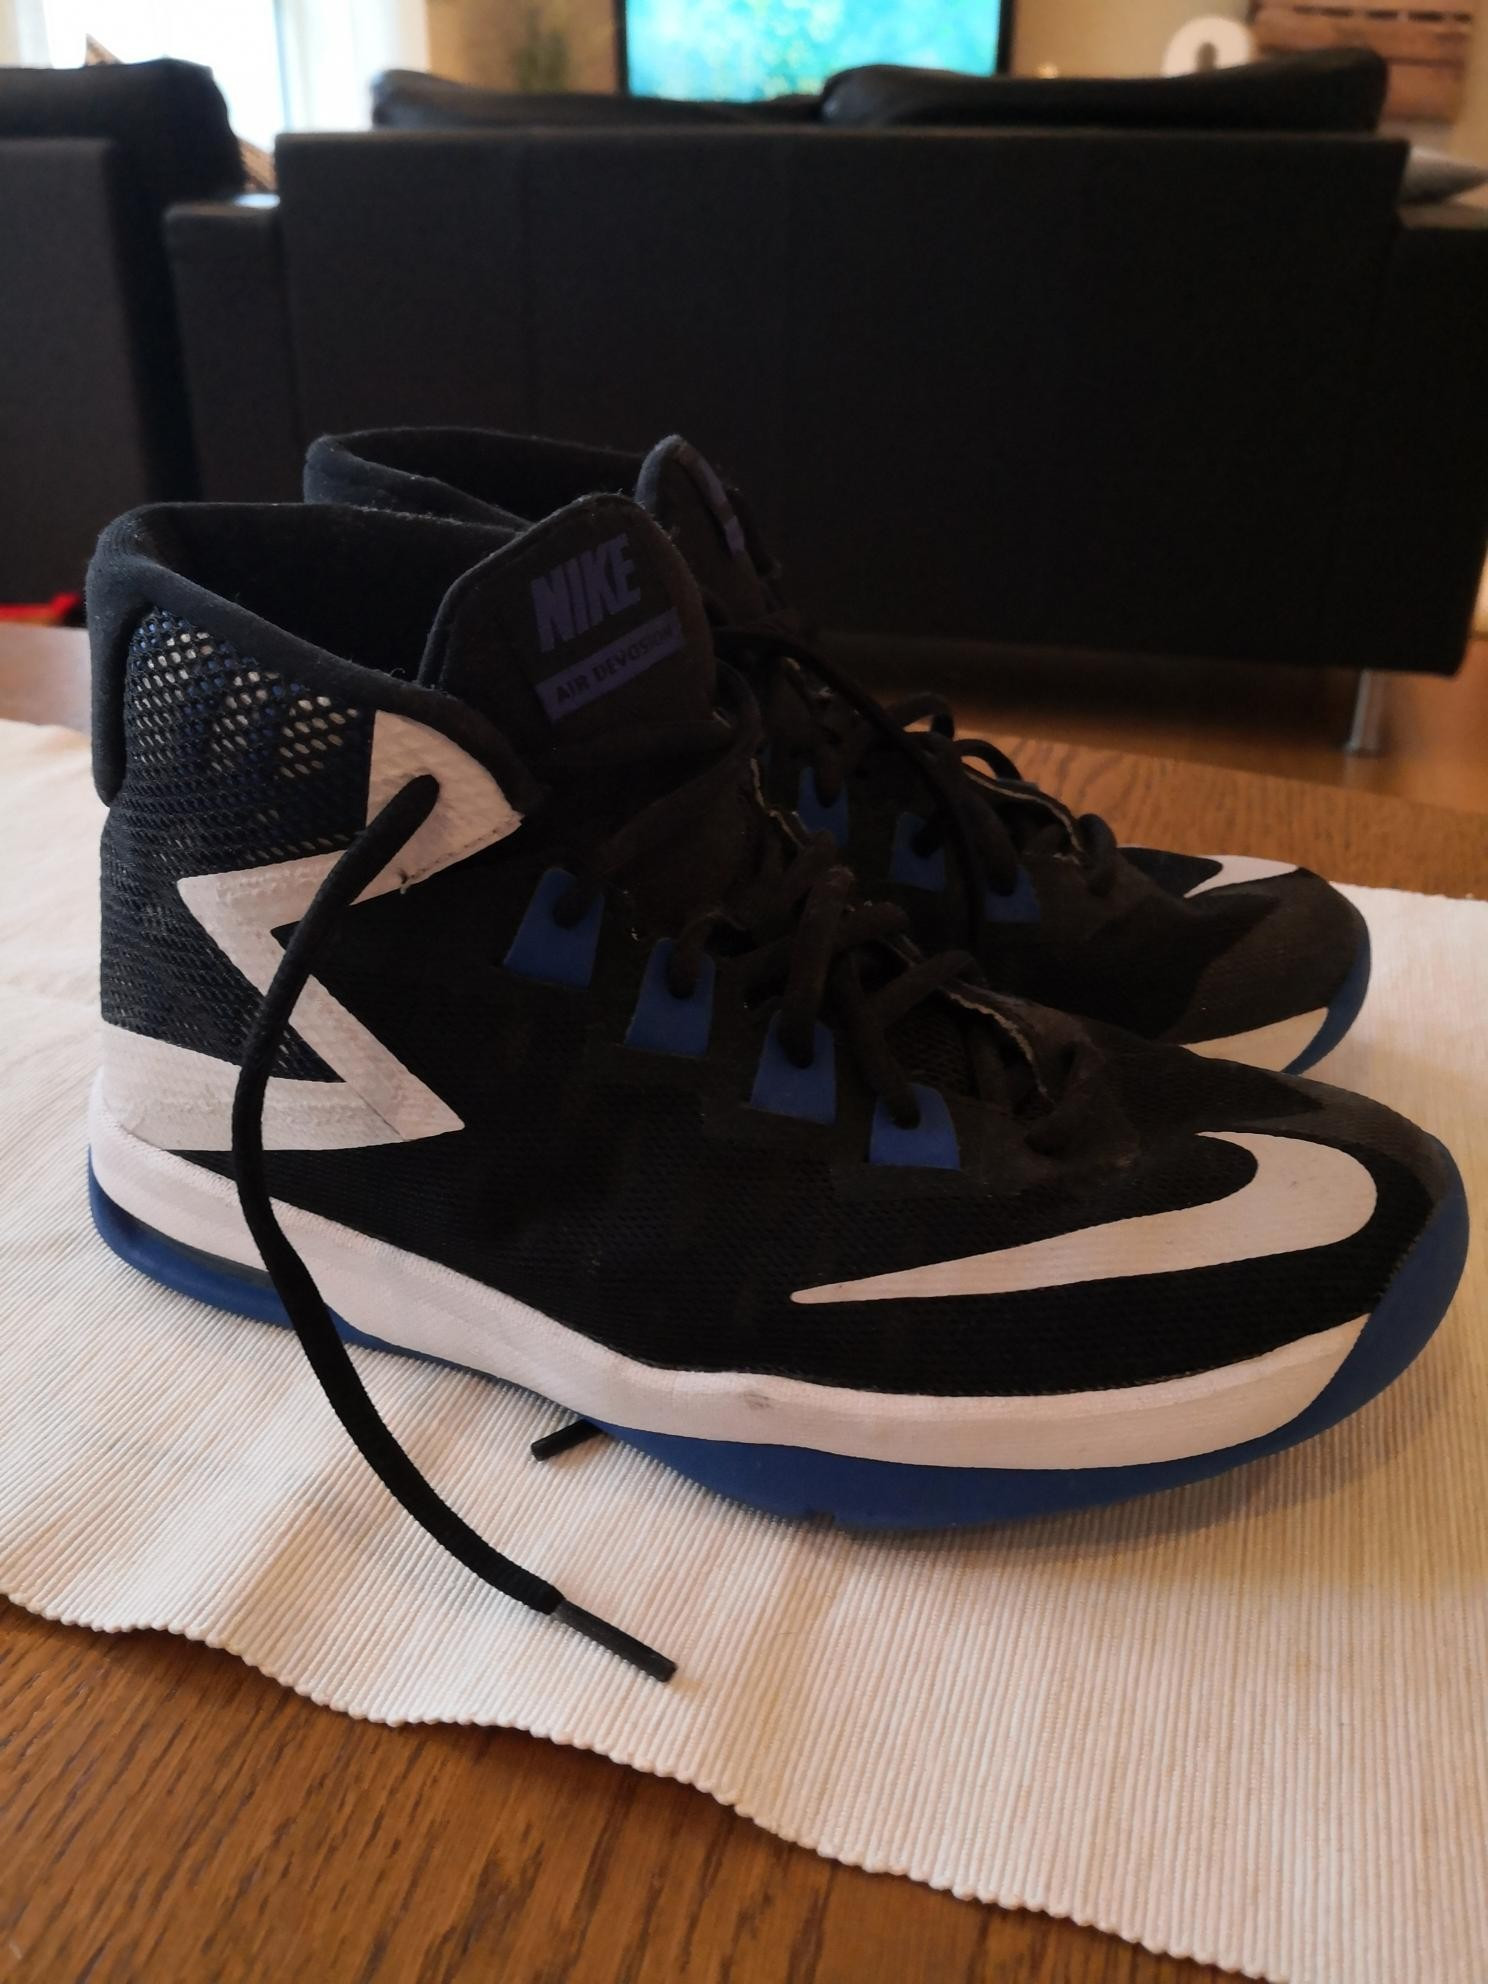 Basketball sko | FINN.no